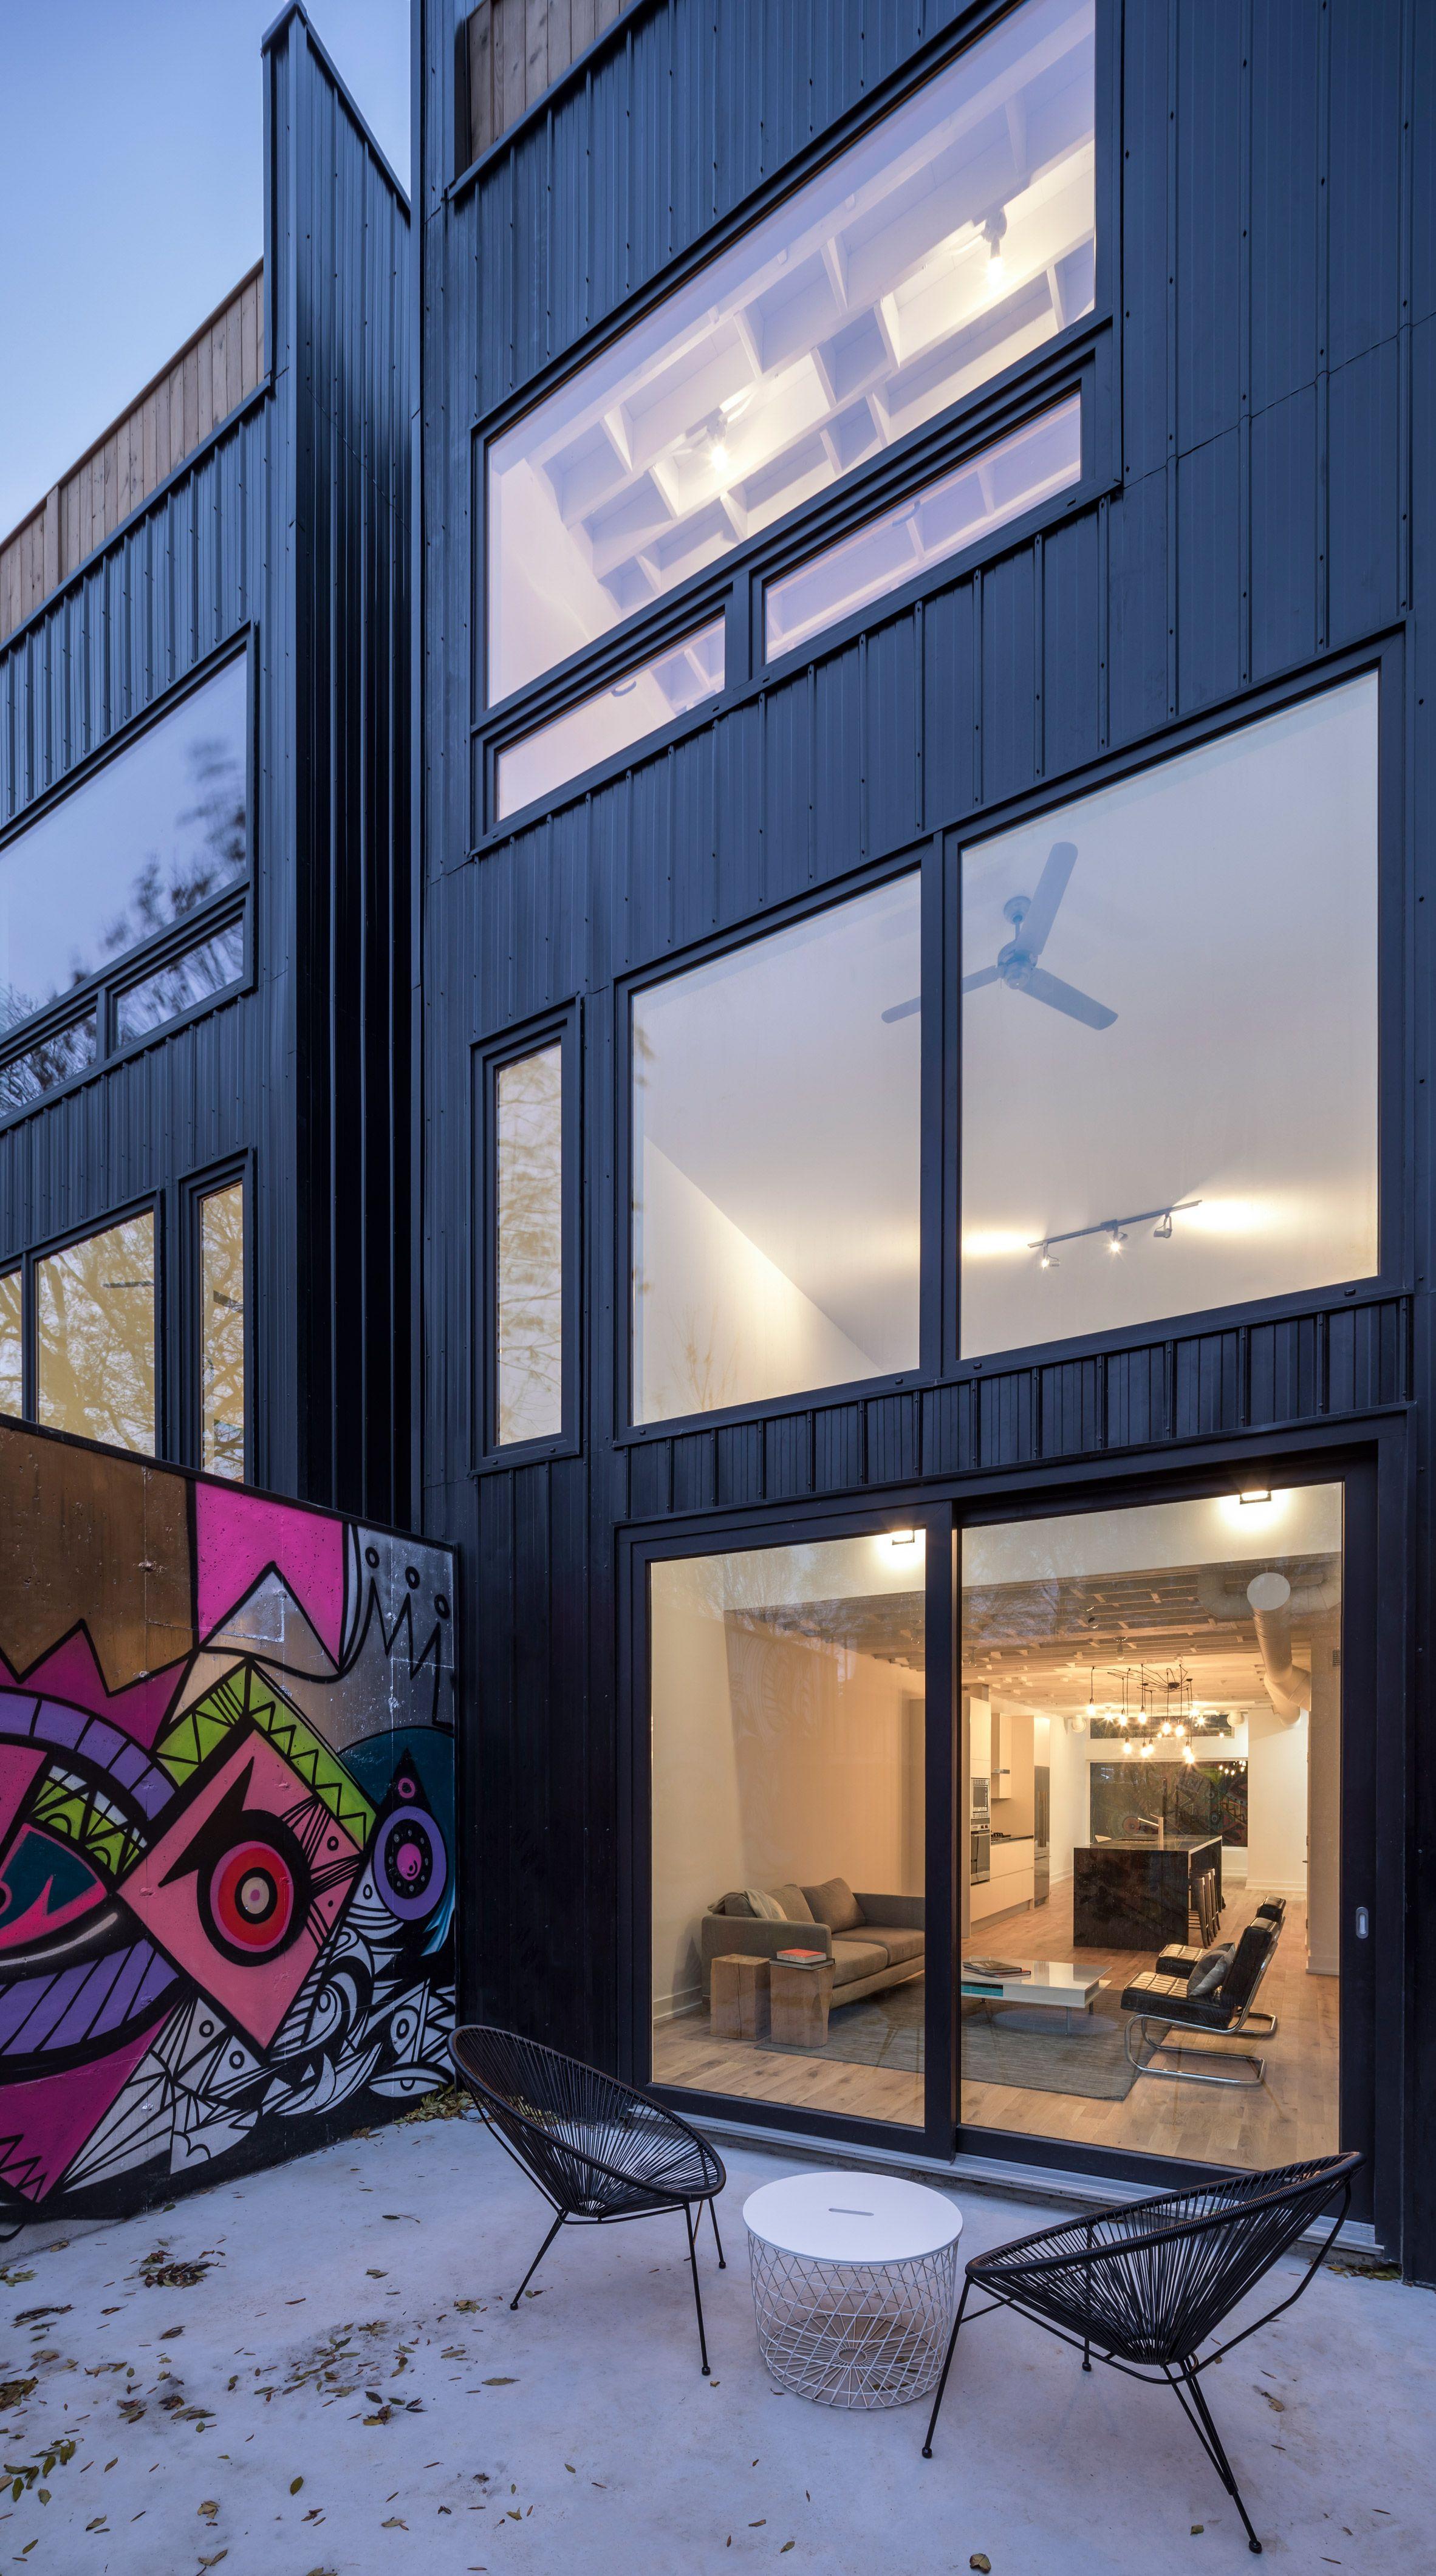 Double duplex by batay csorba architects